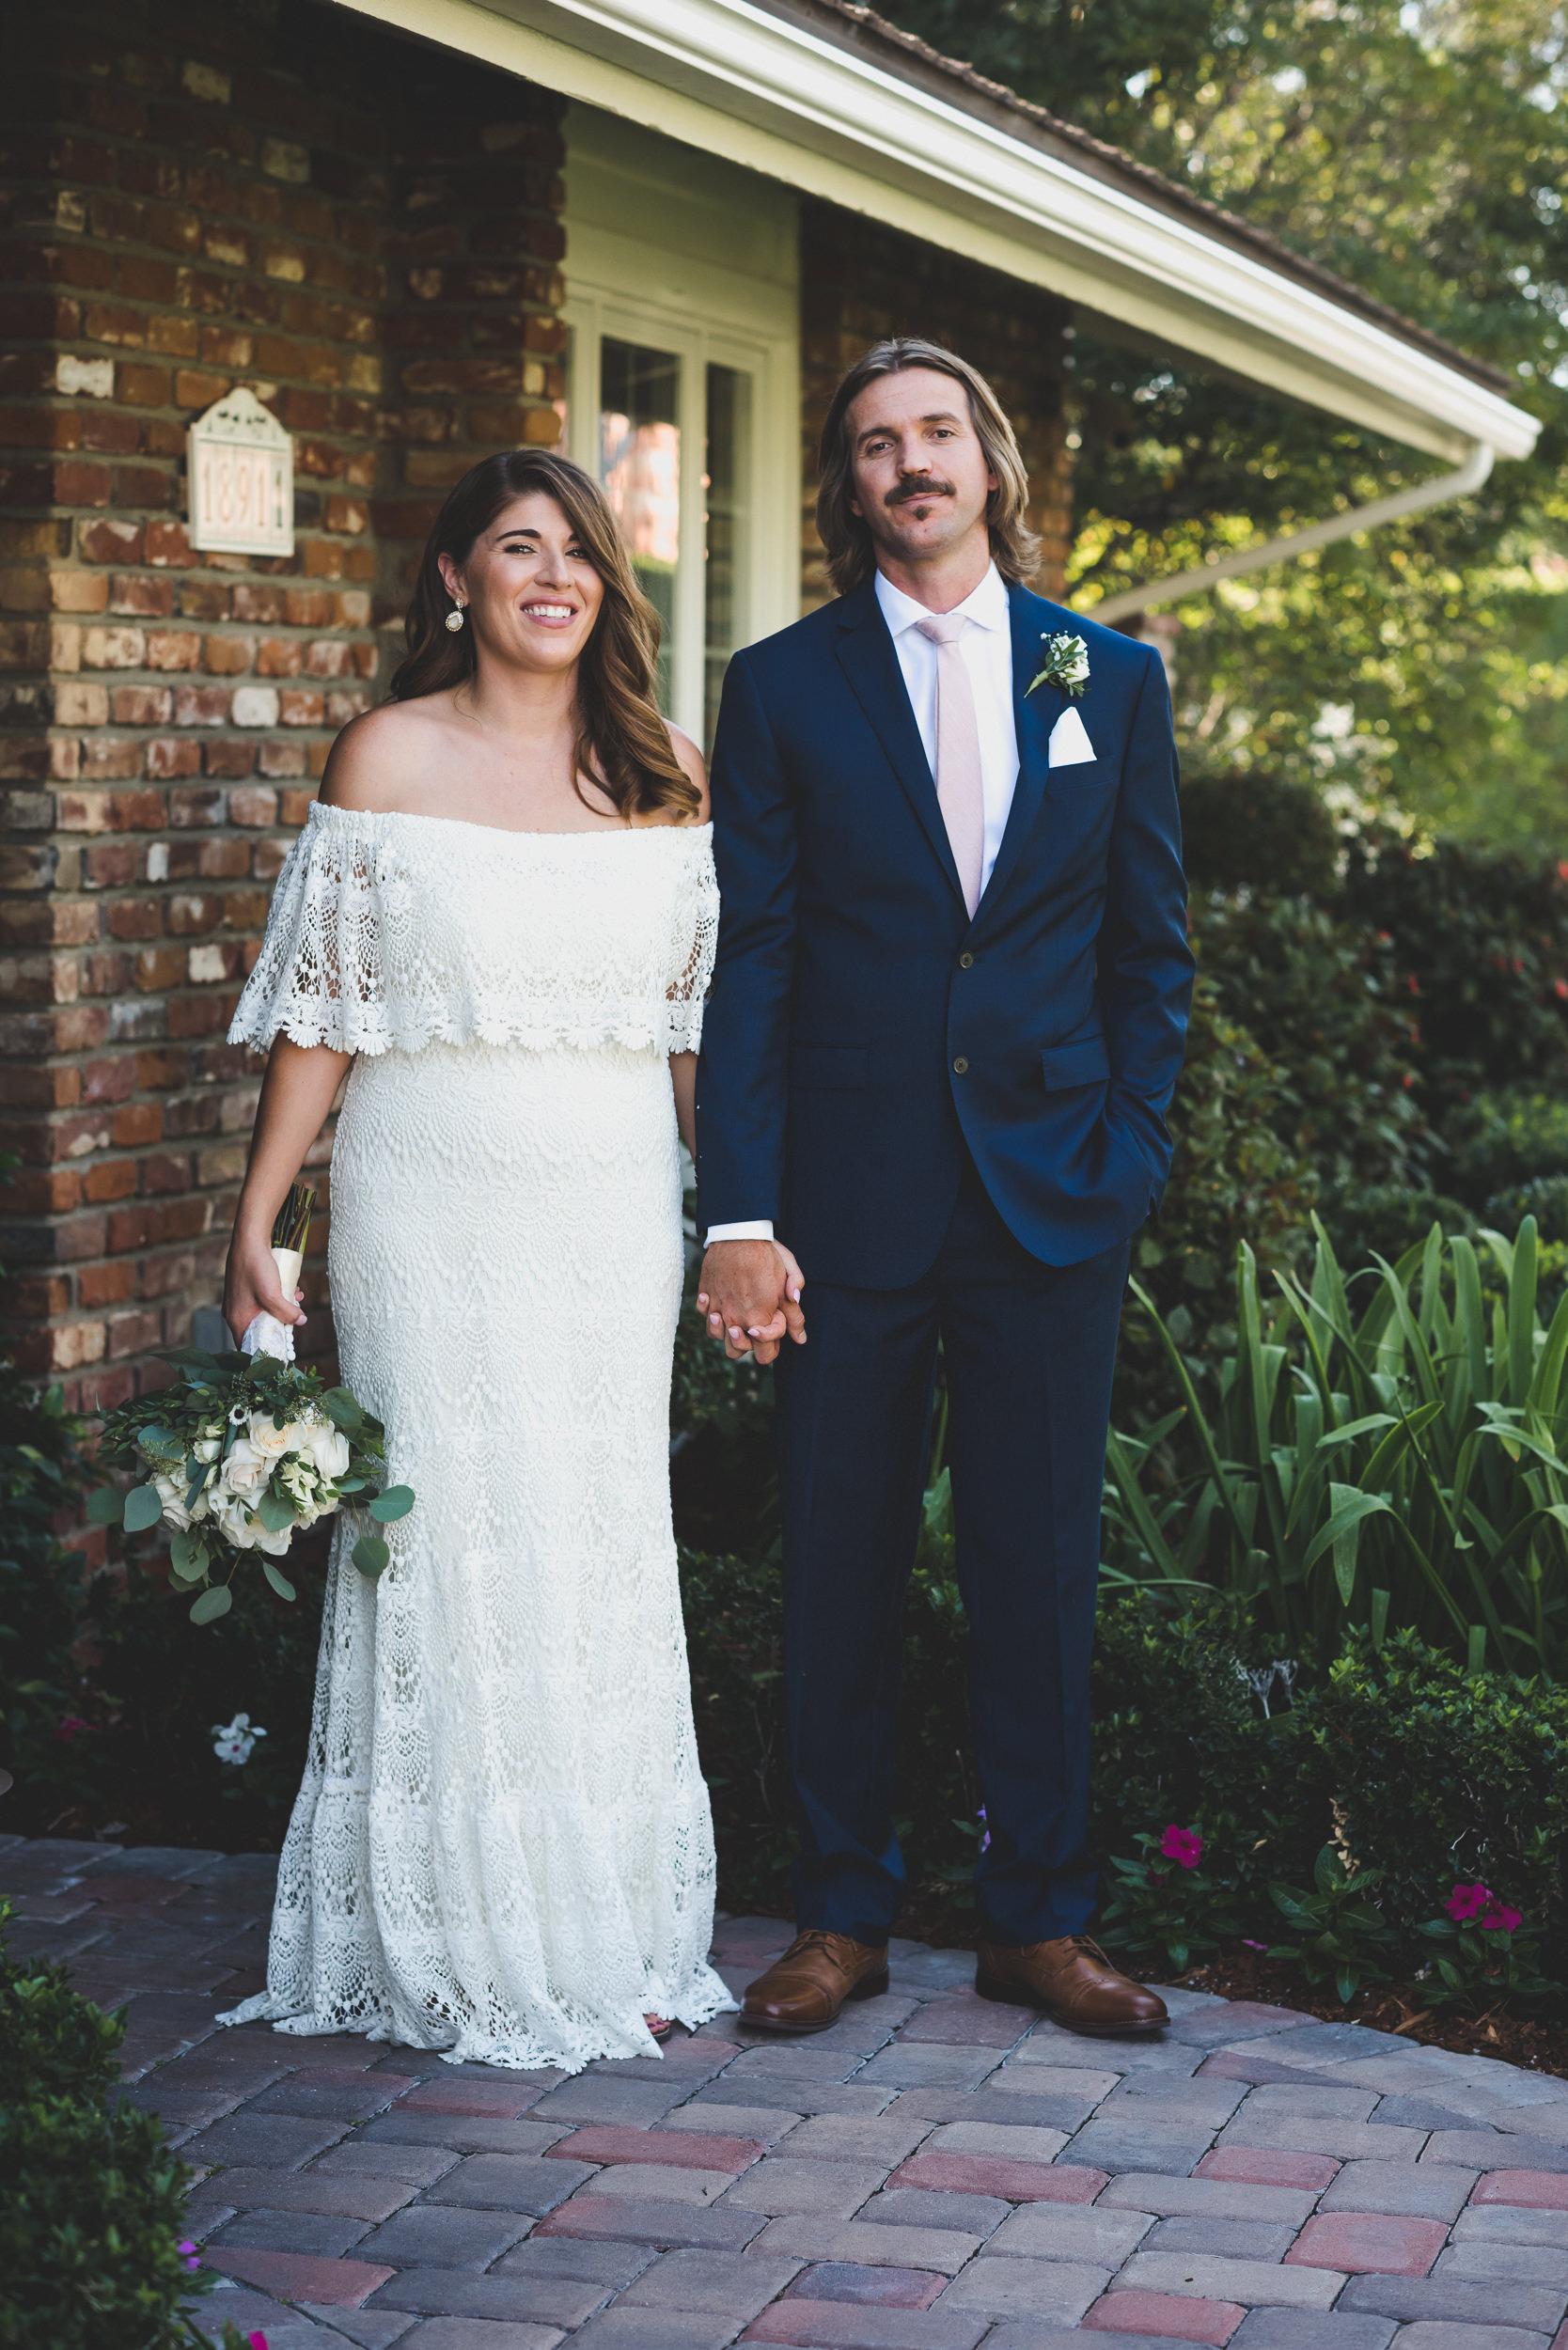 sKatie + Brandon - 07 Bridal Portraits-1.jpg